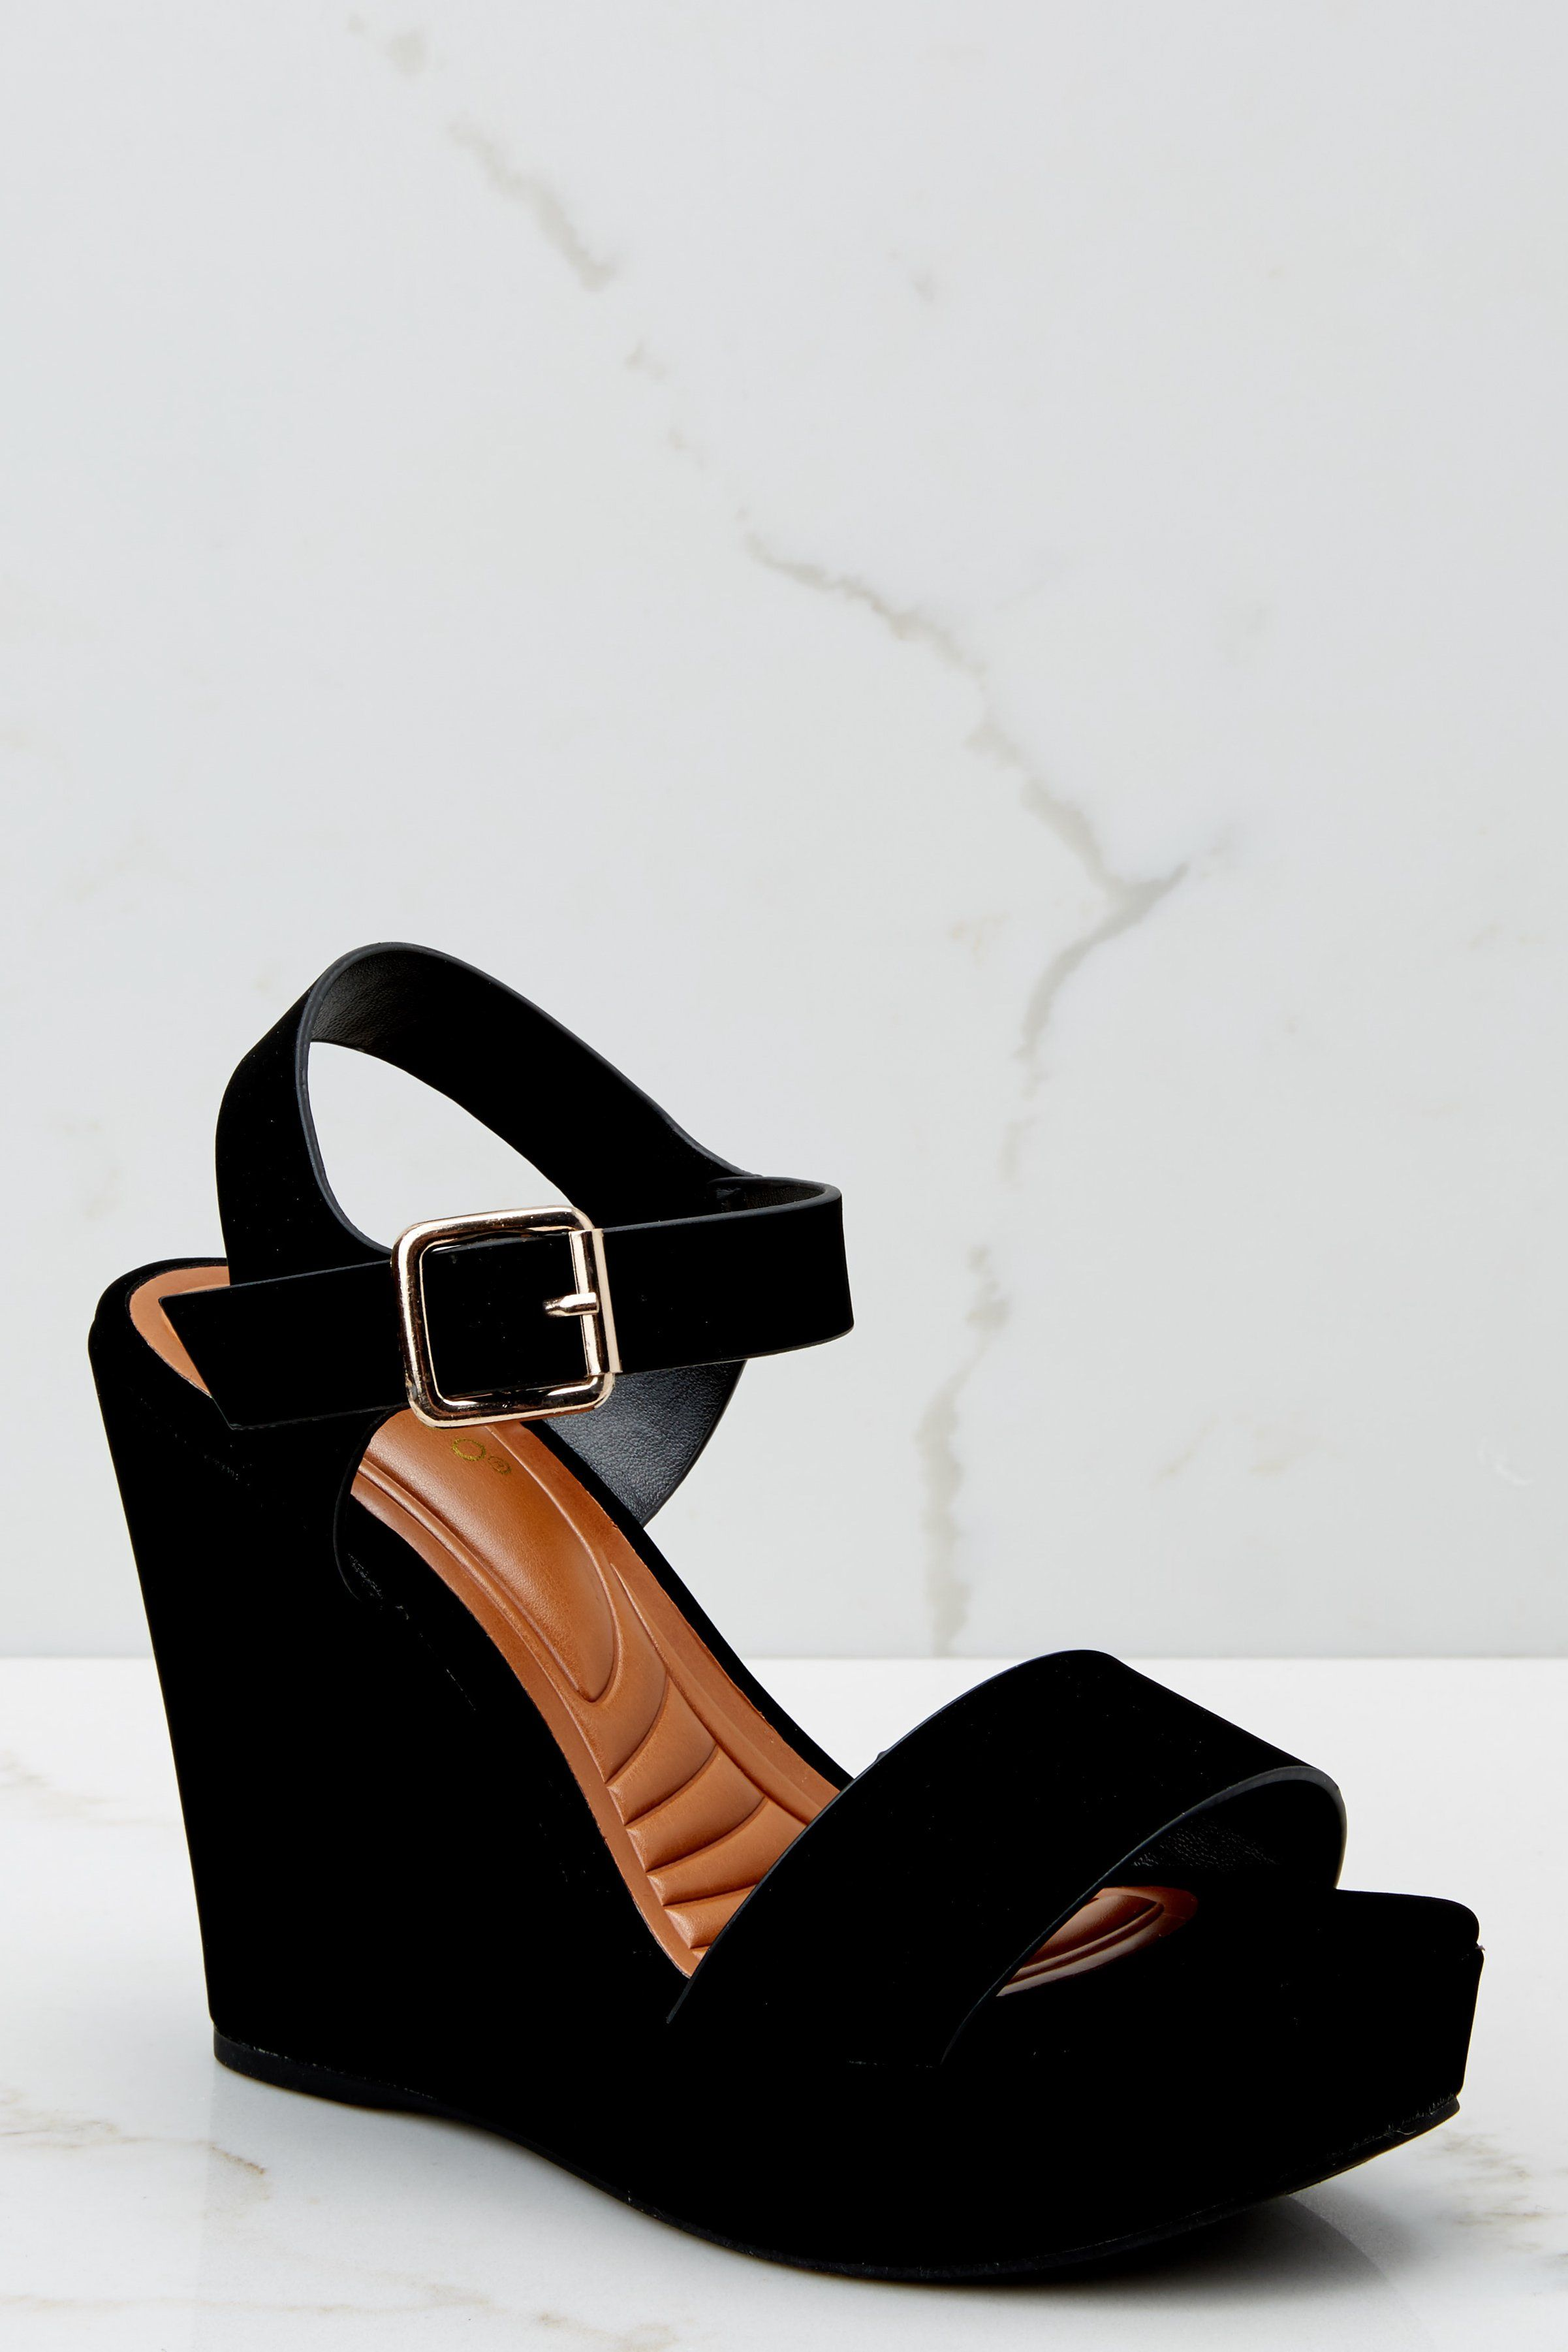 Trendy Black Wedges Chic Wedges Wedges 34 00 Red Dress Boutique Black Heels Wedges Peep Toe Bootie Dress Up Shoes [ 3602 x 2402 Pixel ]